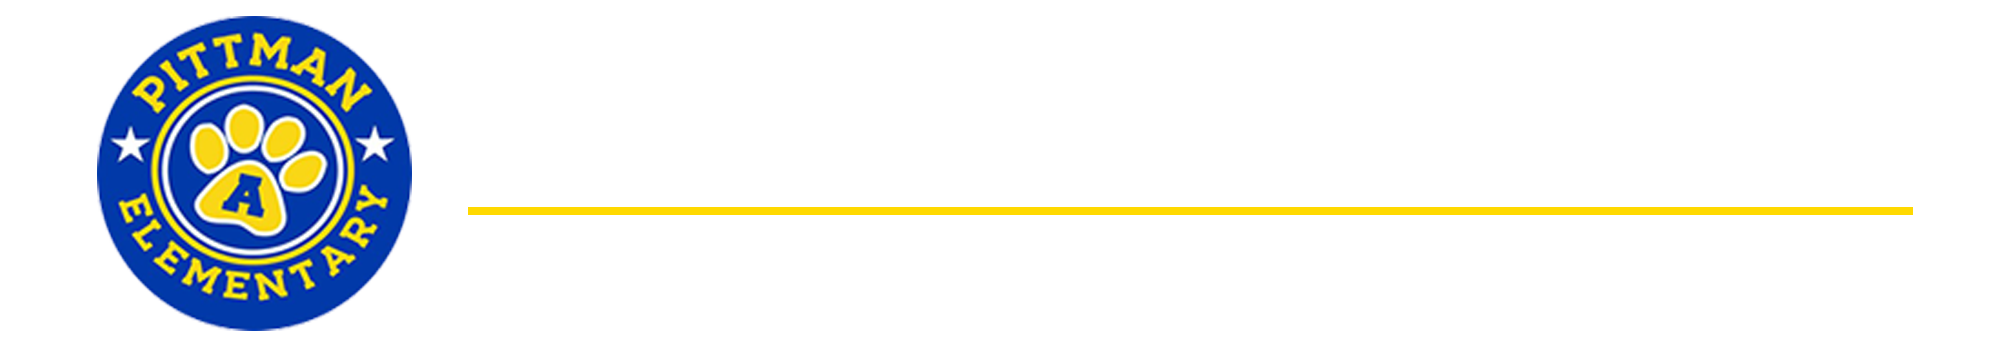 Pittman Elementary School Logo